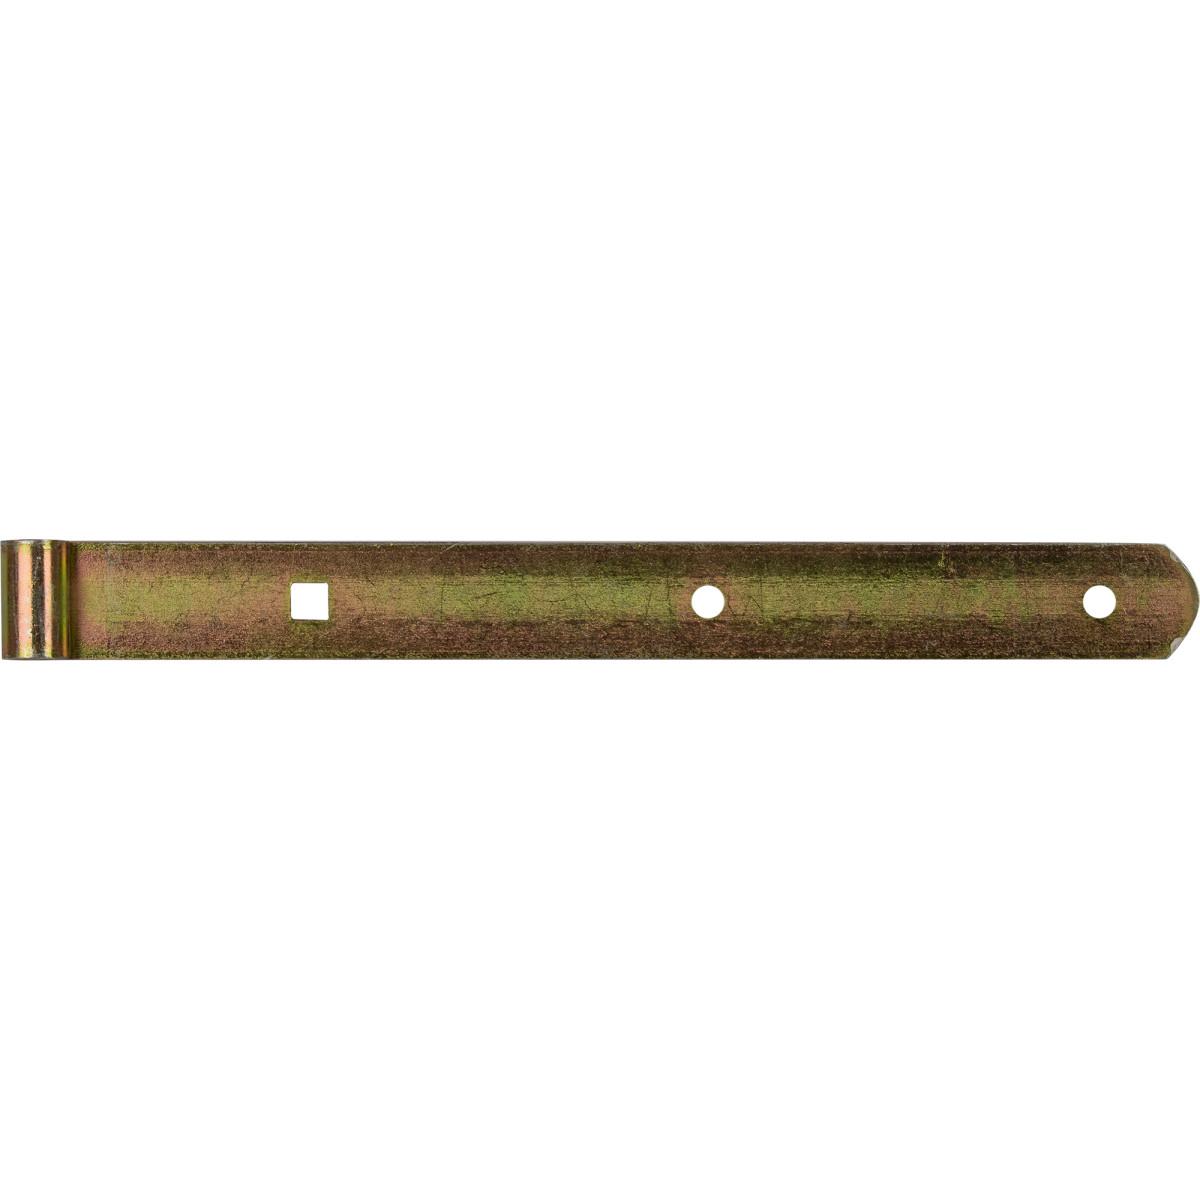 Петля воротная накидная d 10 300x30х3 мм